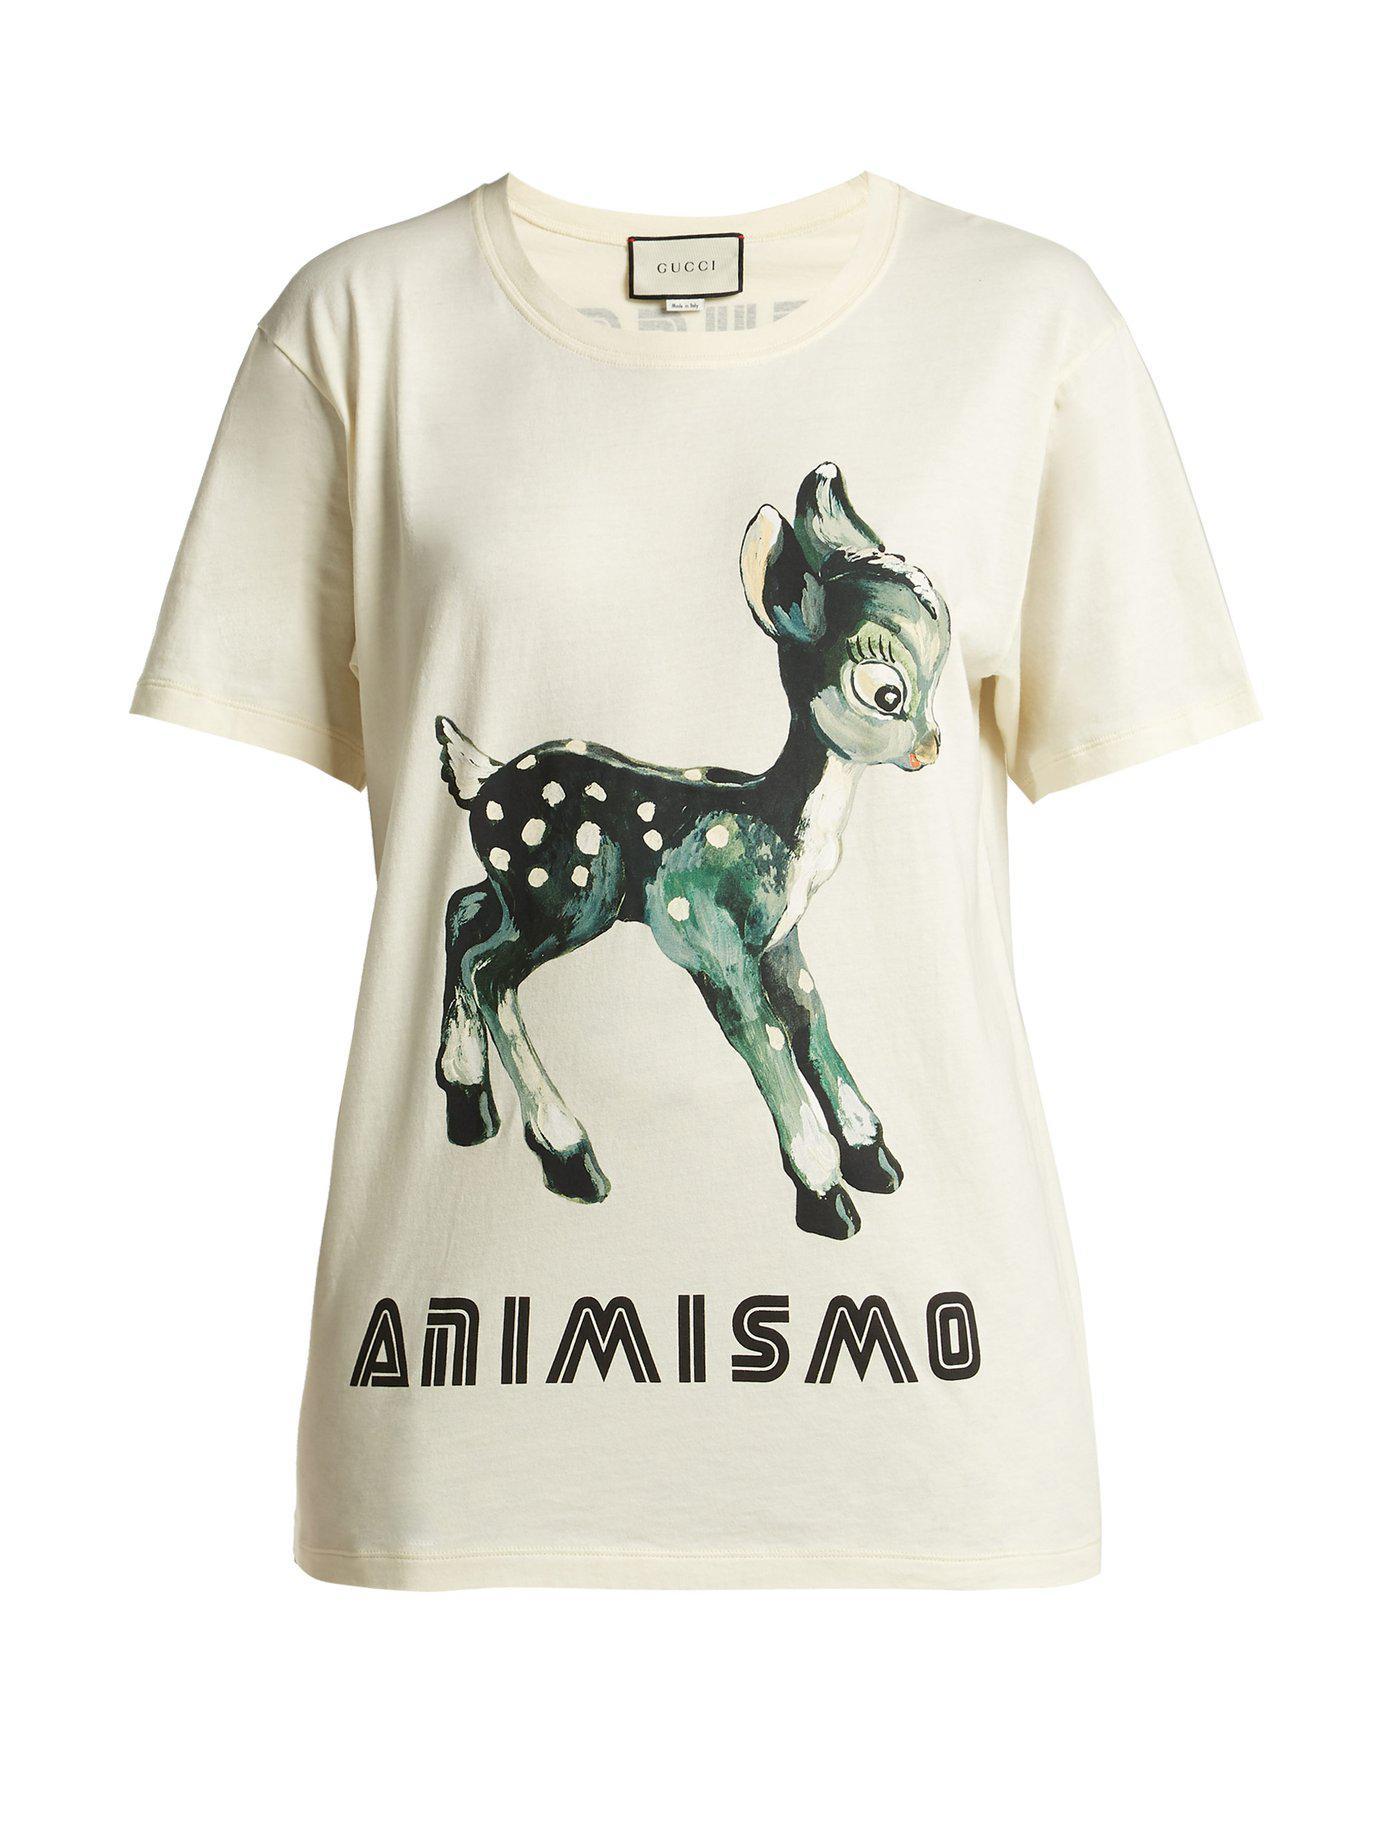 77ebc2a6ef7 Gucci - White Animismo Print Cotton T Shirt - Lyst. View fullscreen